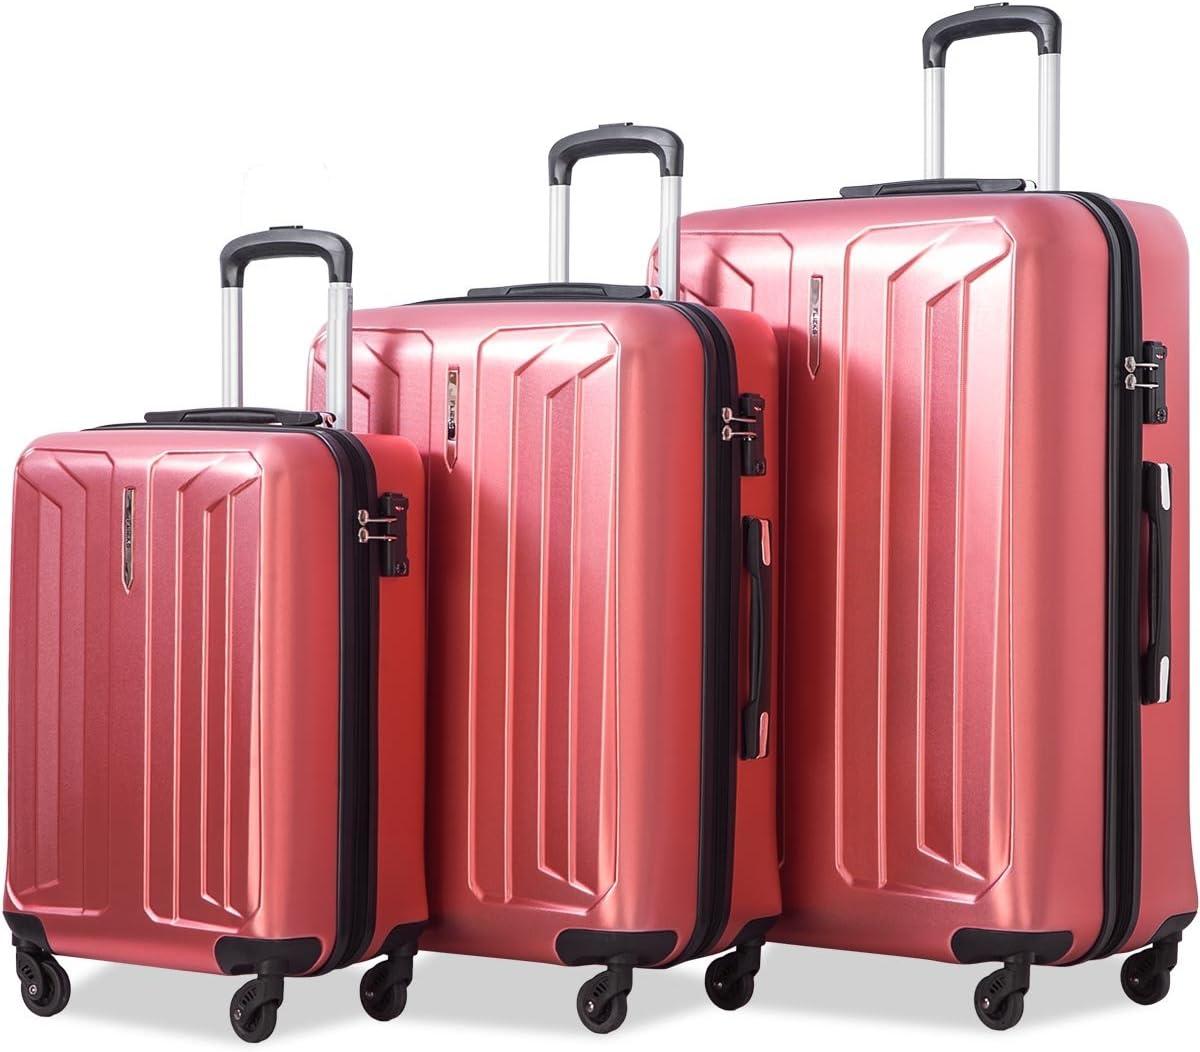 Flieks Luggage 3 Piece Sets Spinner Suitcase with TSA Lock, Lightweight 20 24 28 Red